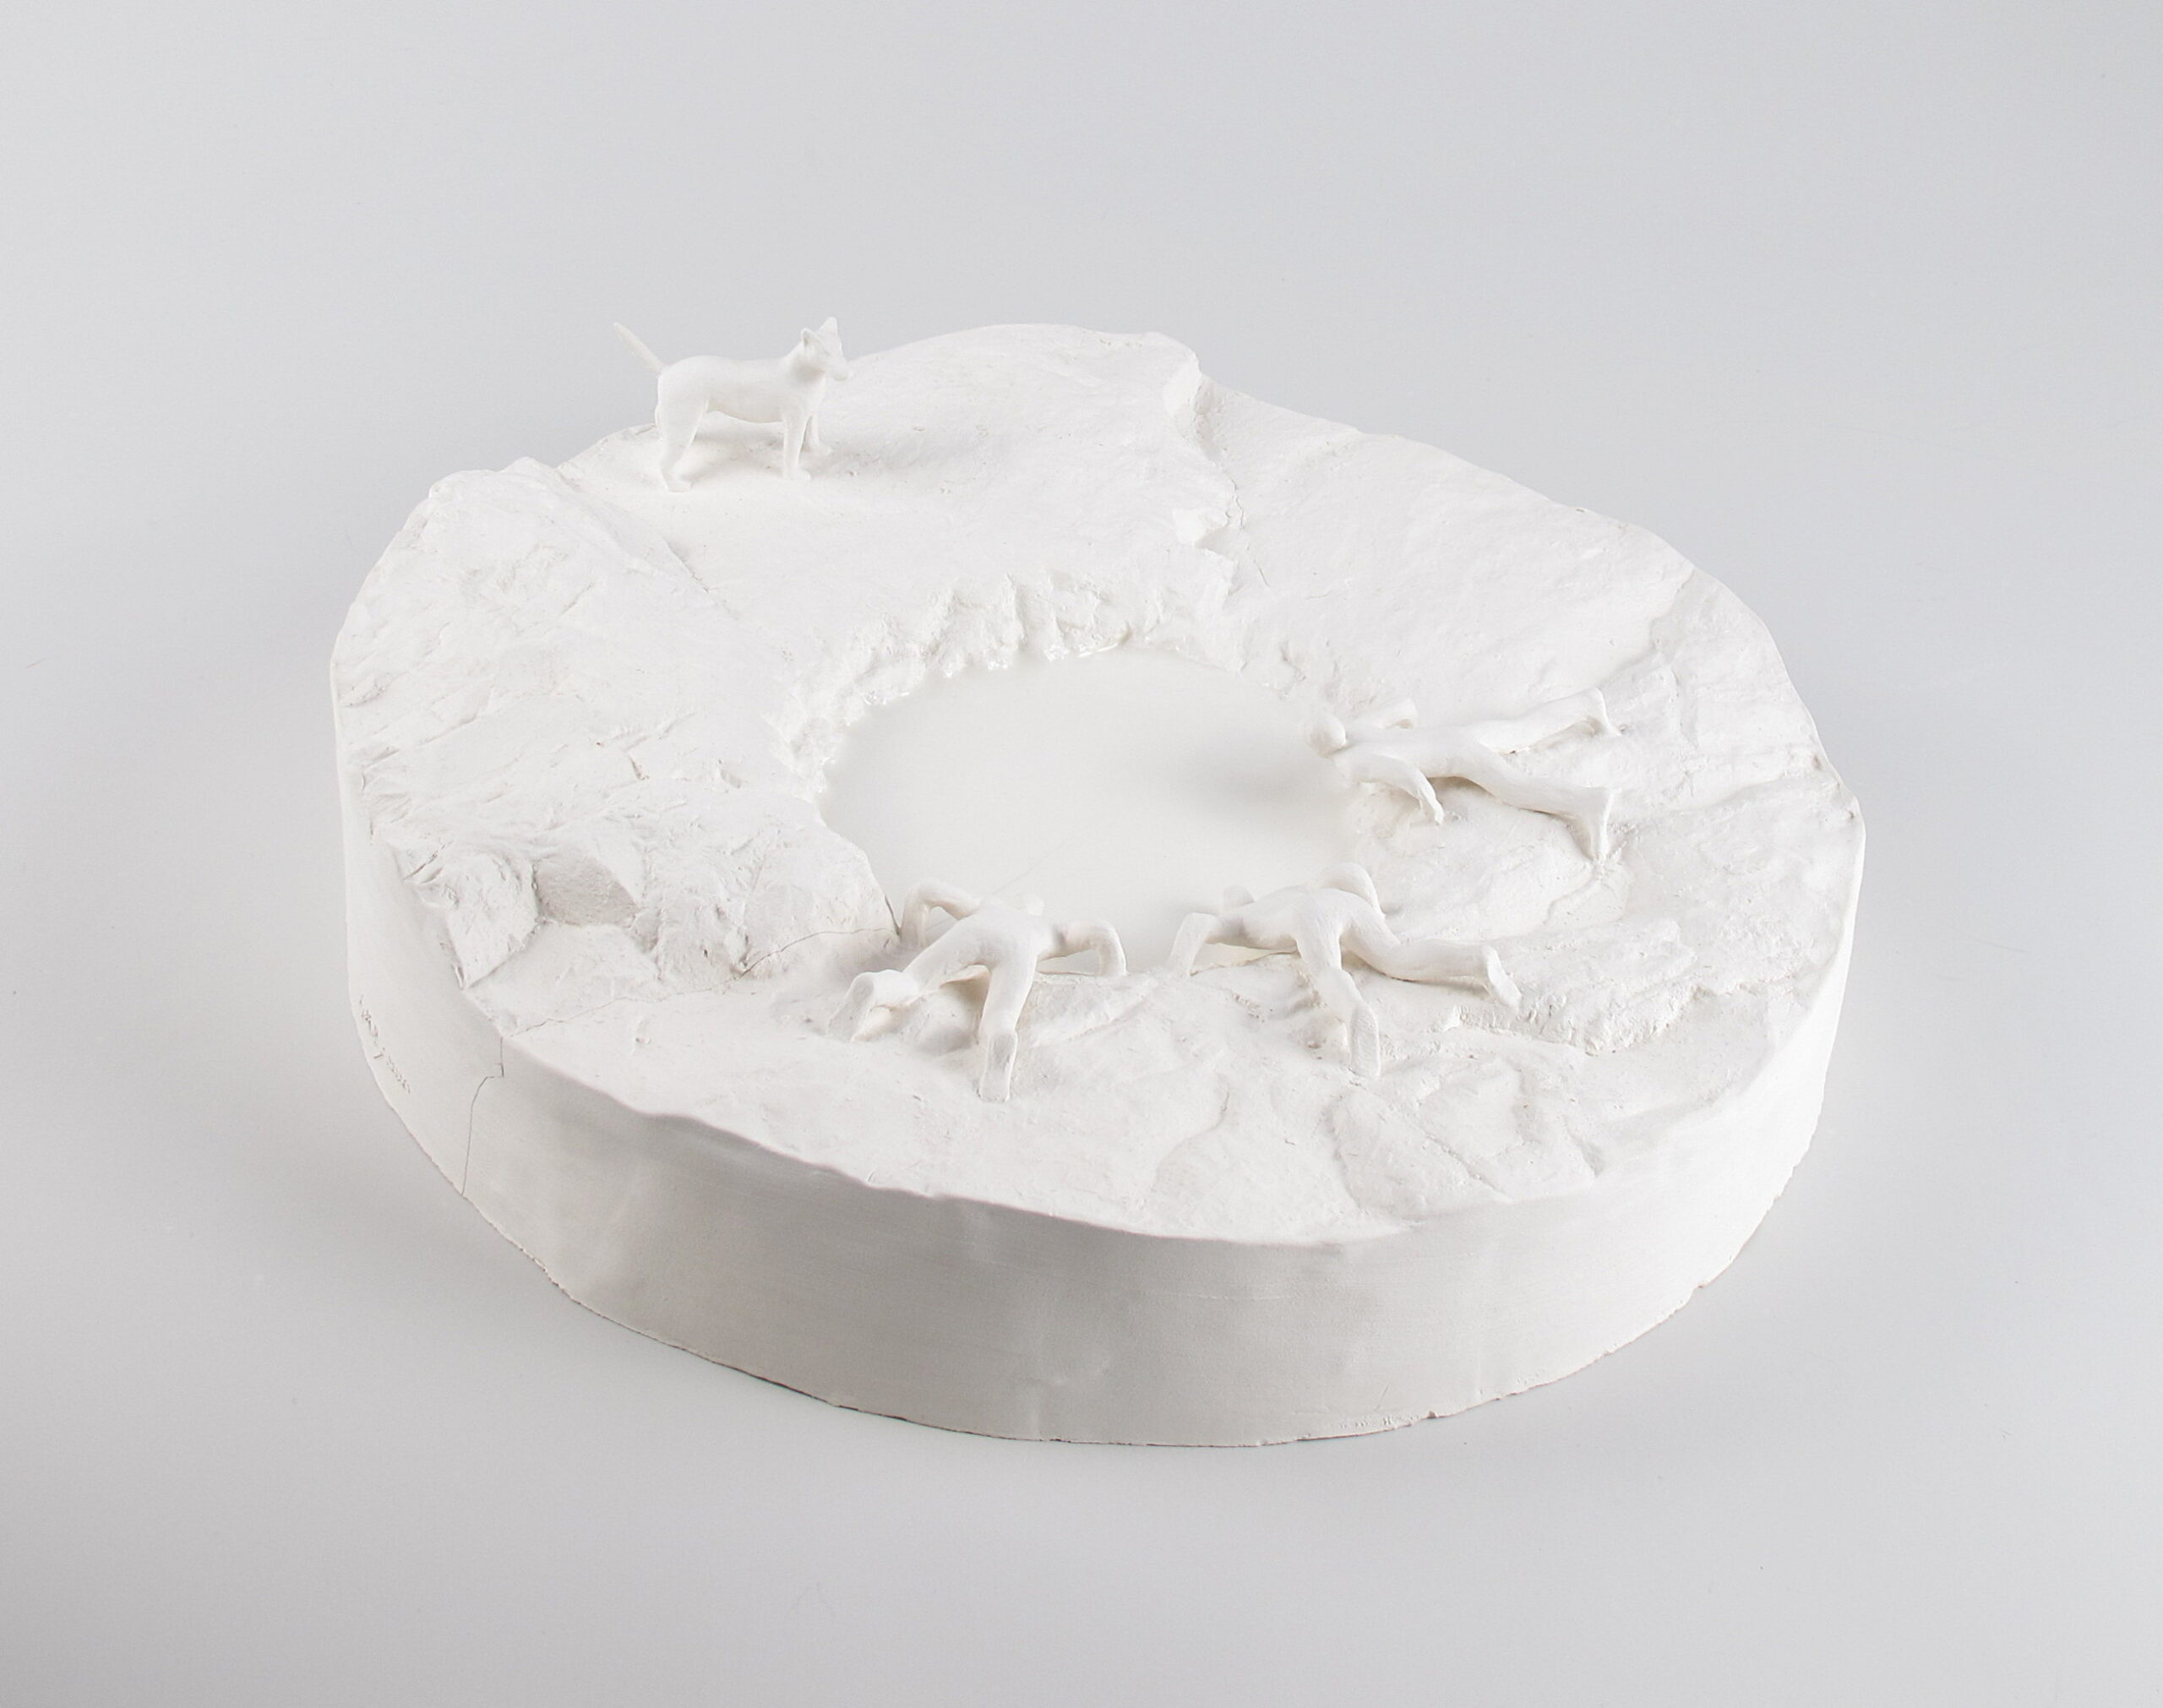 Gabriele mallegni wildness sculpture Studio17 2021